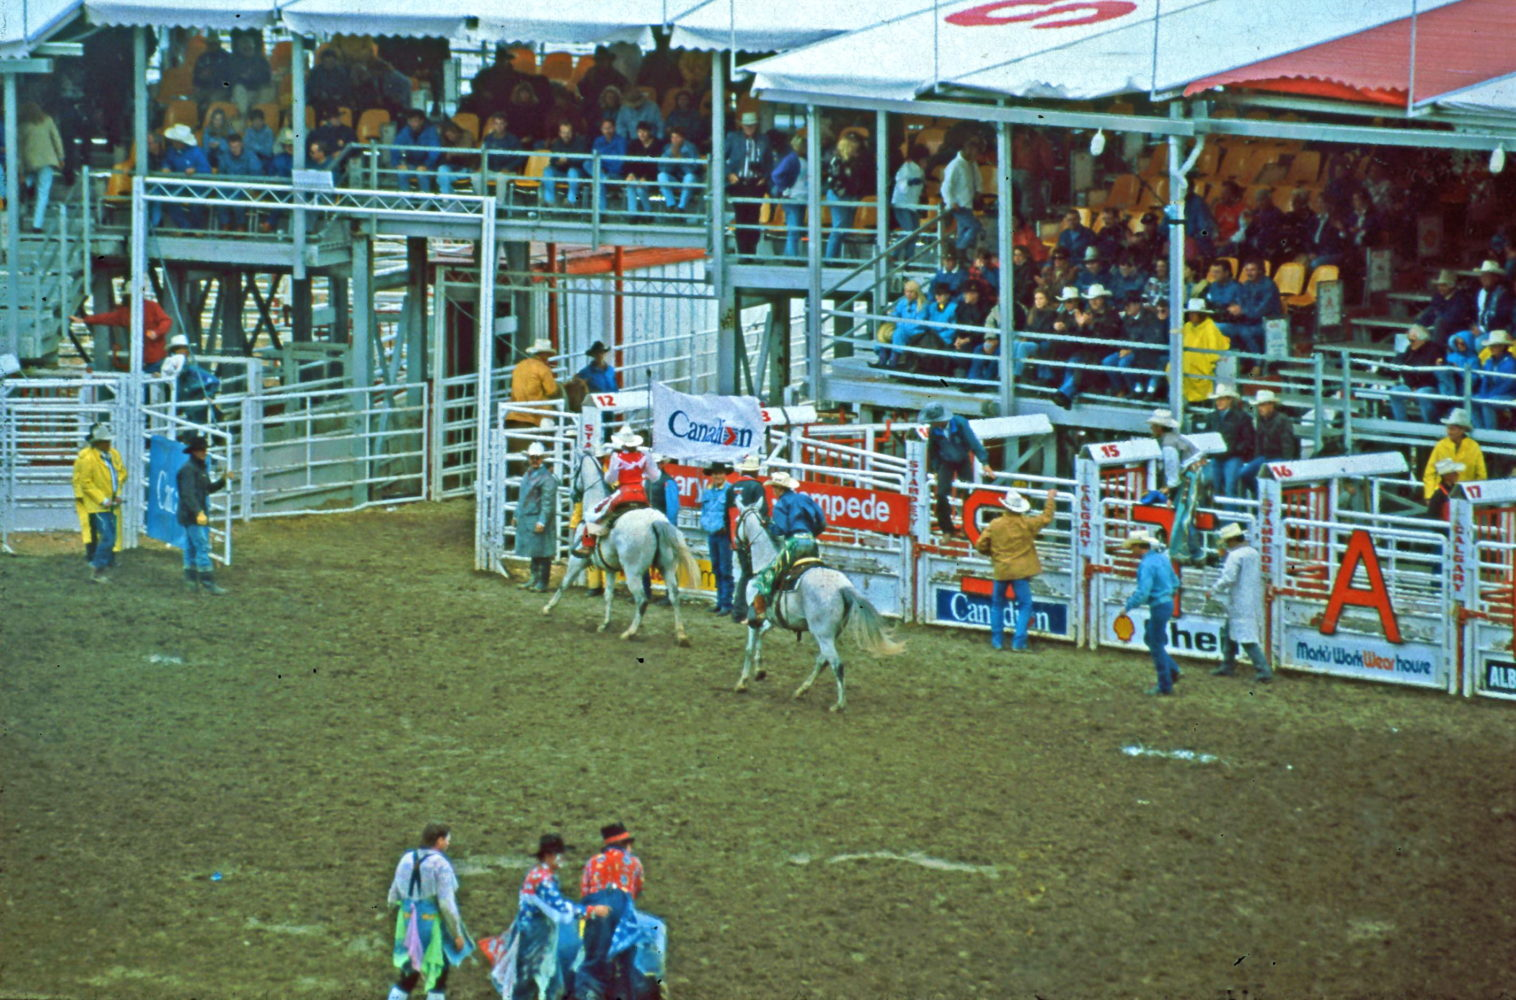 Stampede Calgary Größtes Rodeo in Nordamerika ©HorstReitz1992